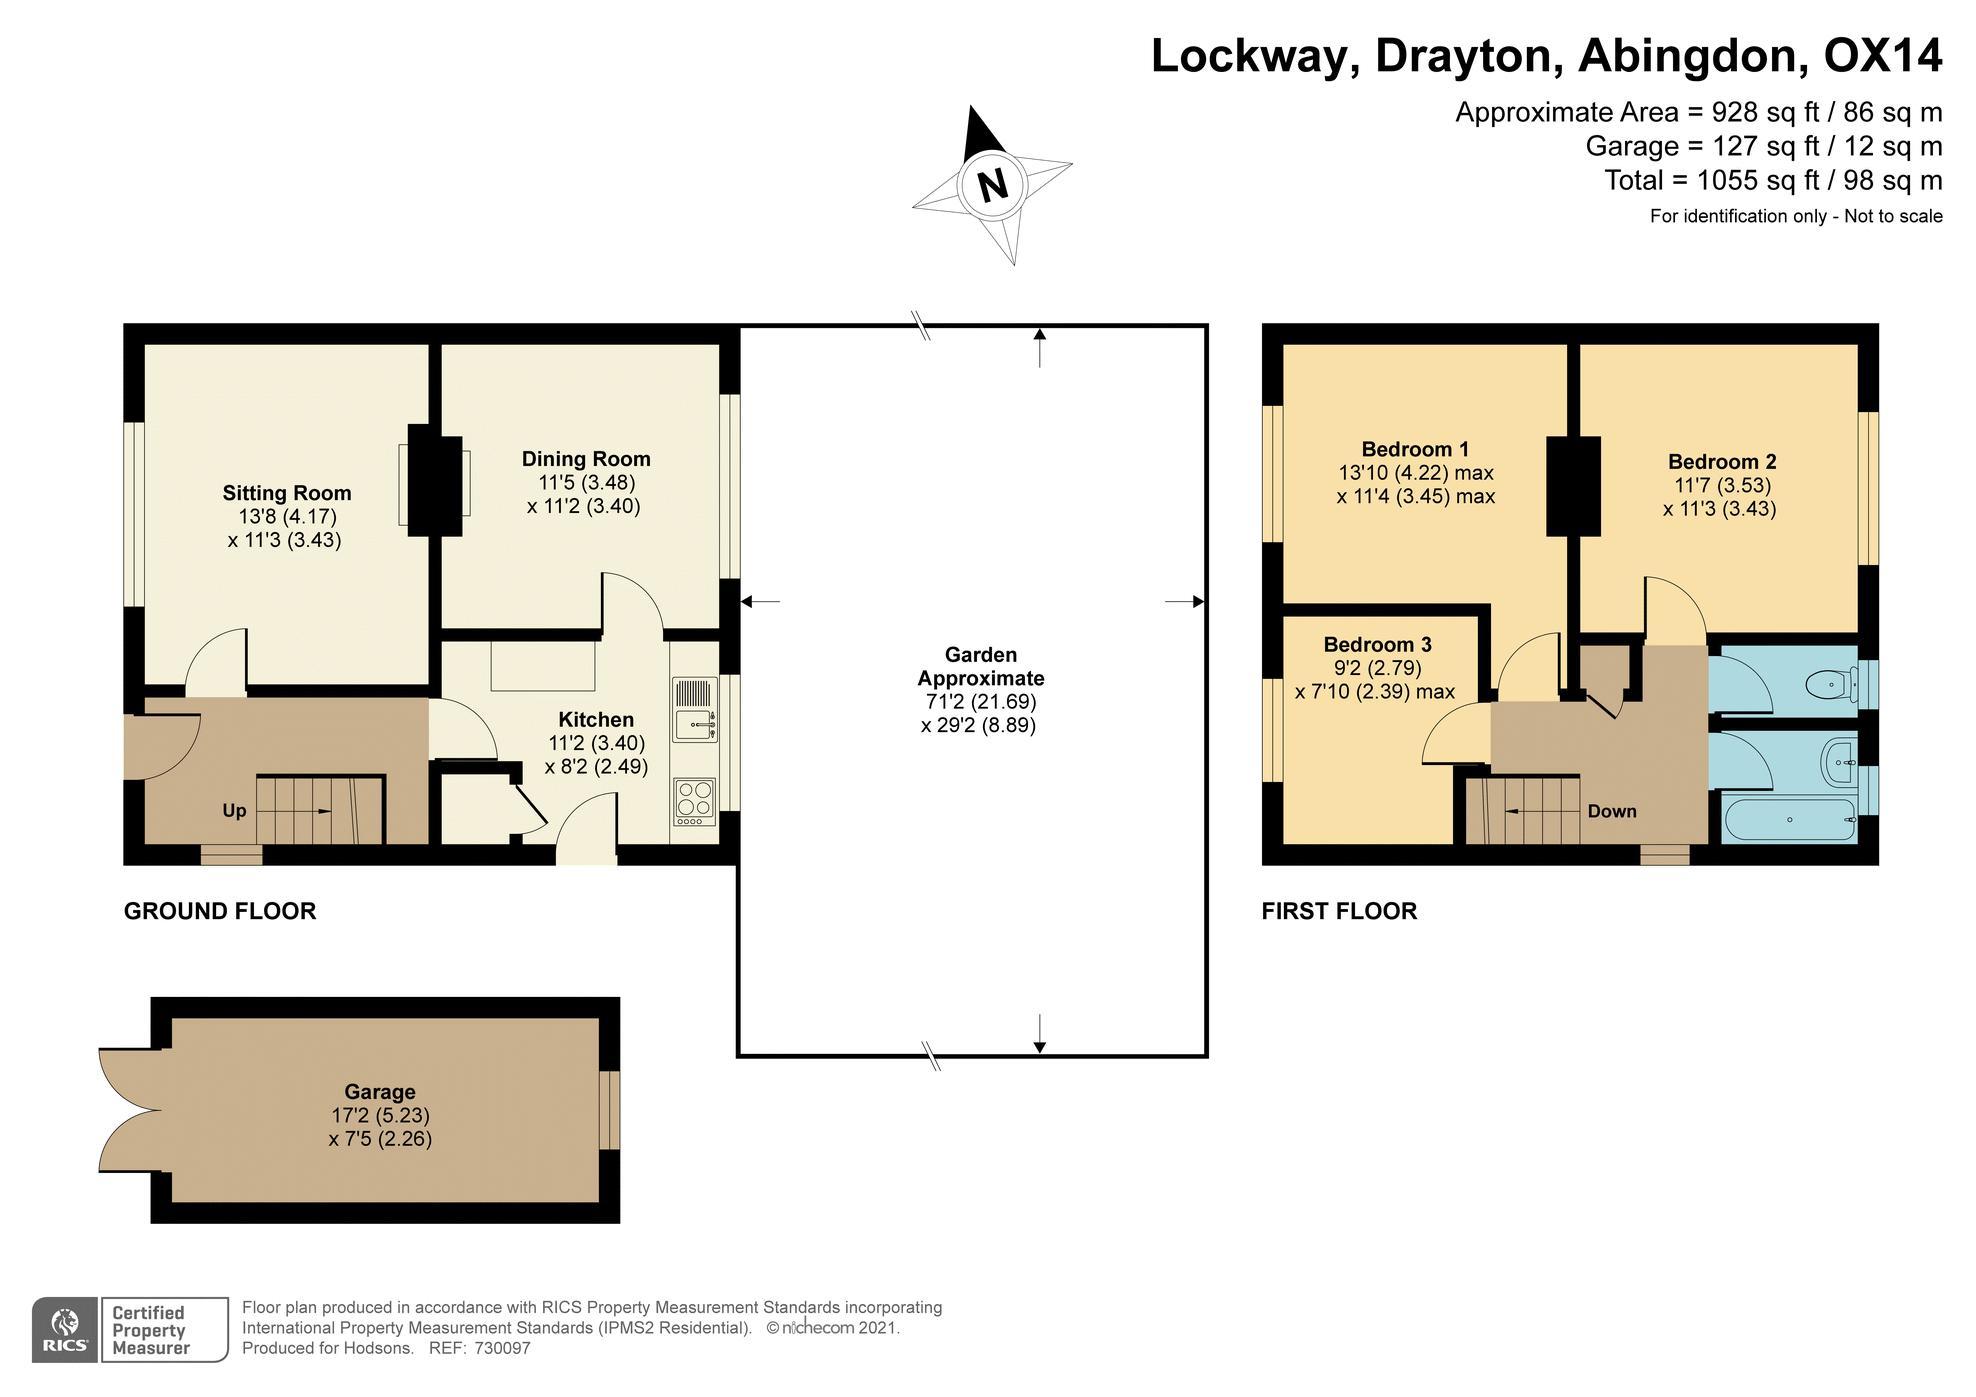 Lockway Drayton